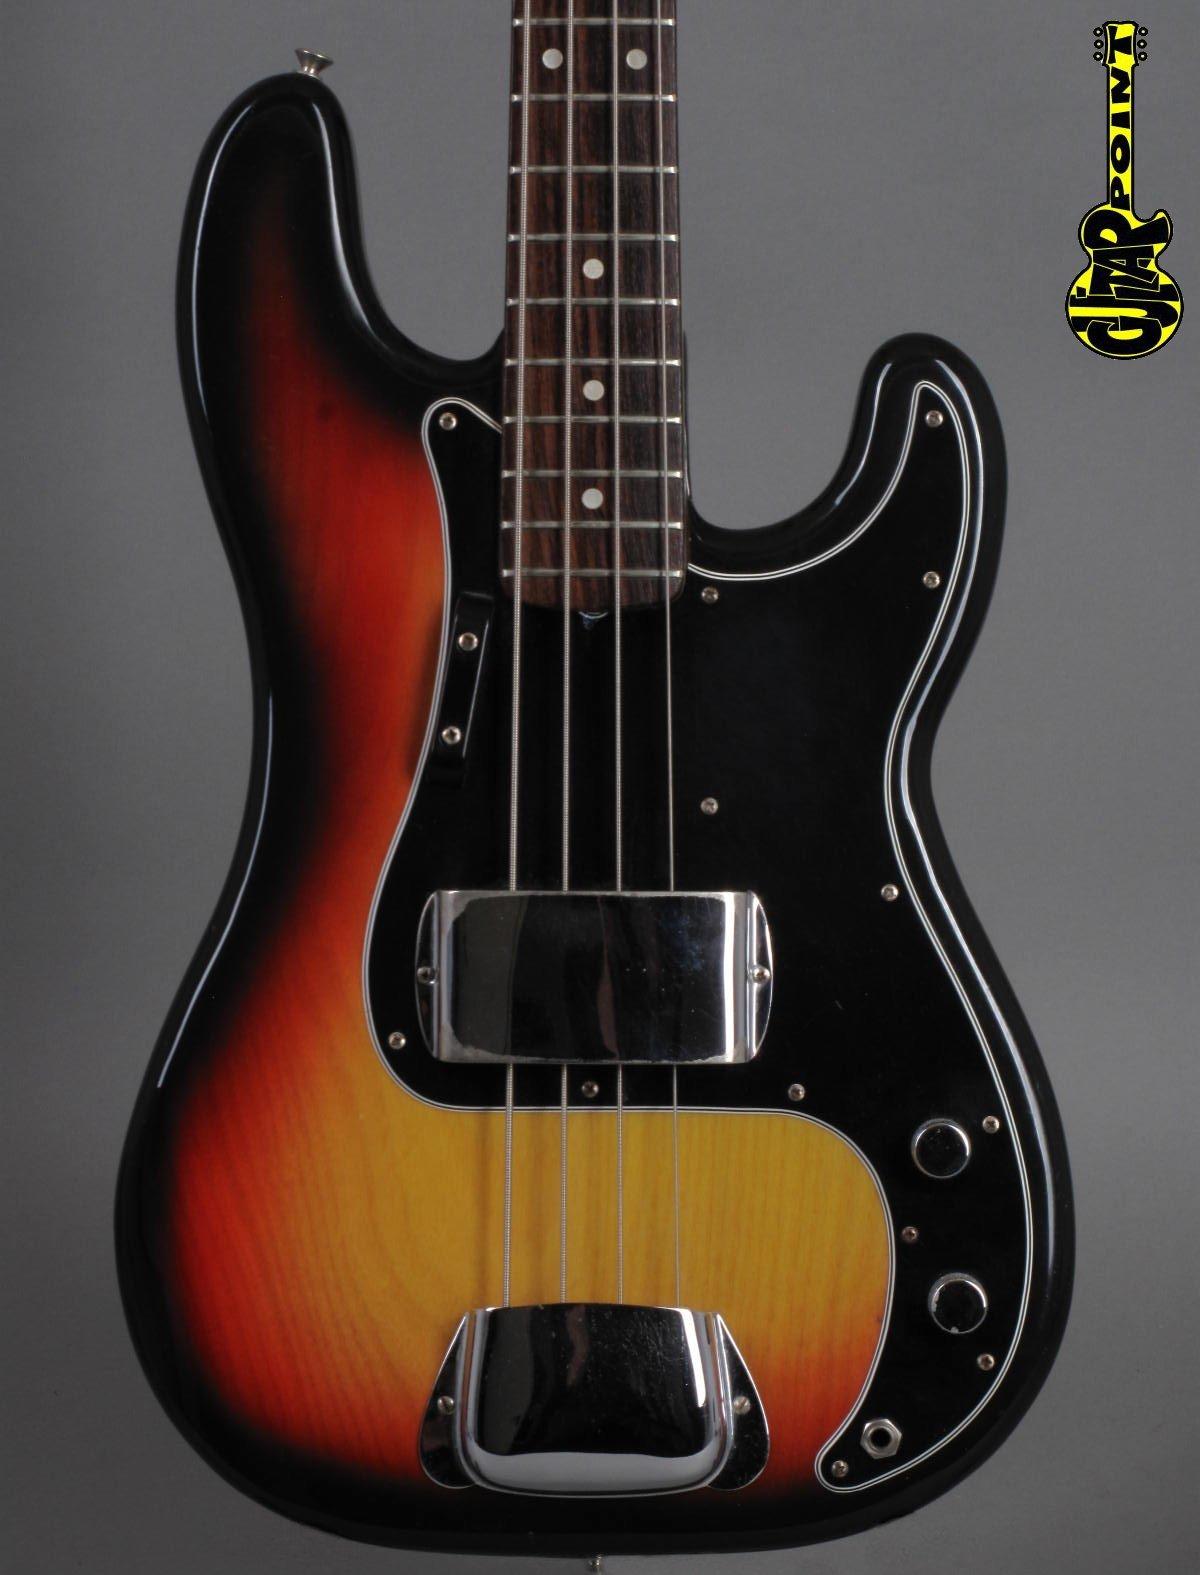 1976 Fender Precision Bass - 3-tone Sunburst